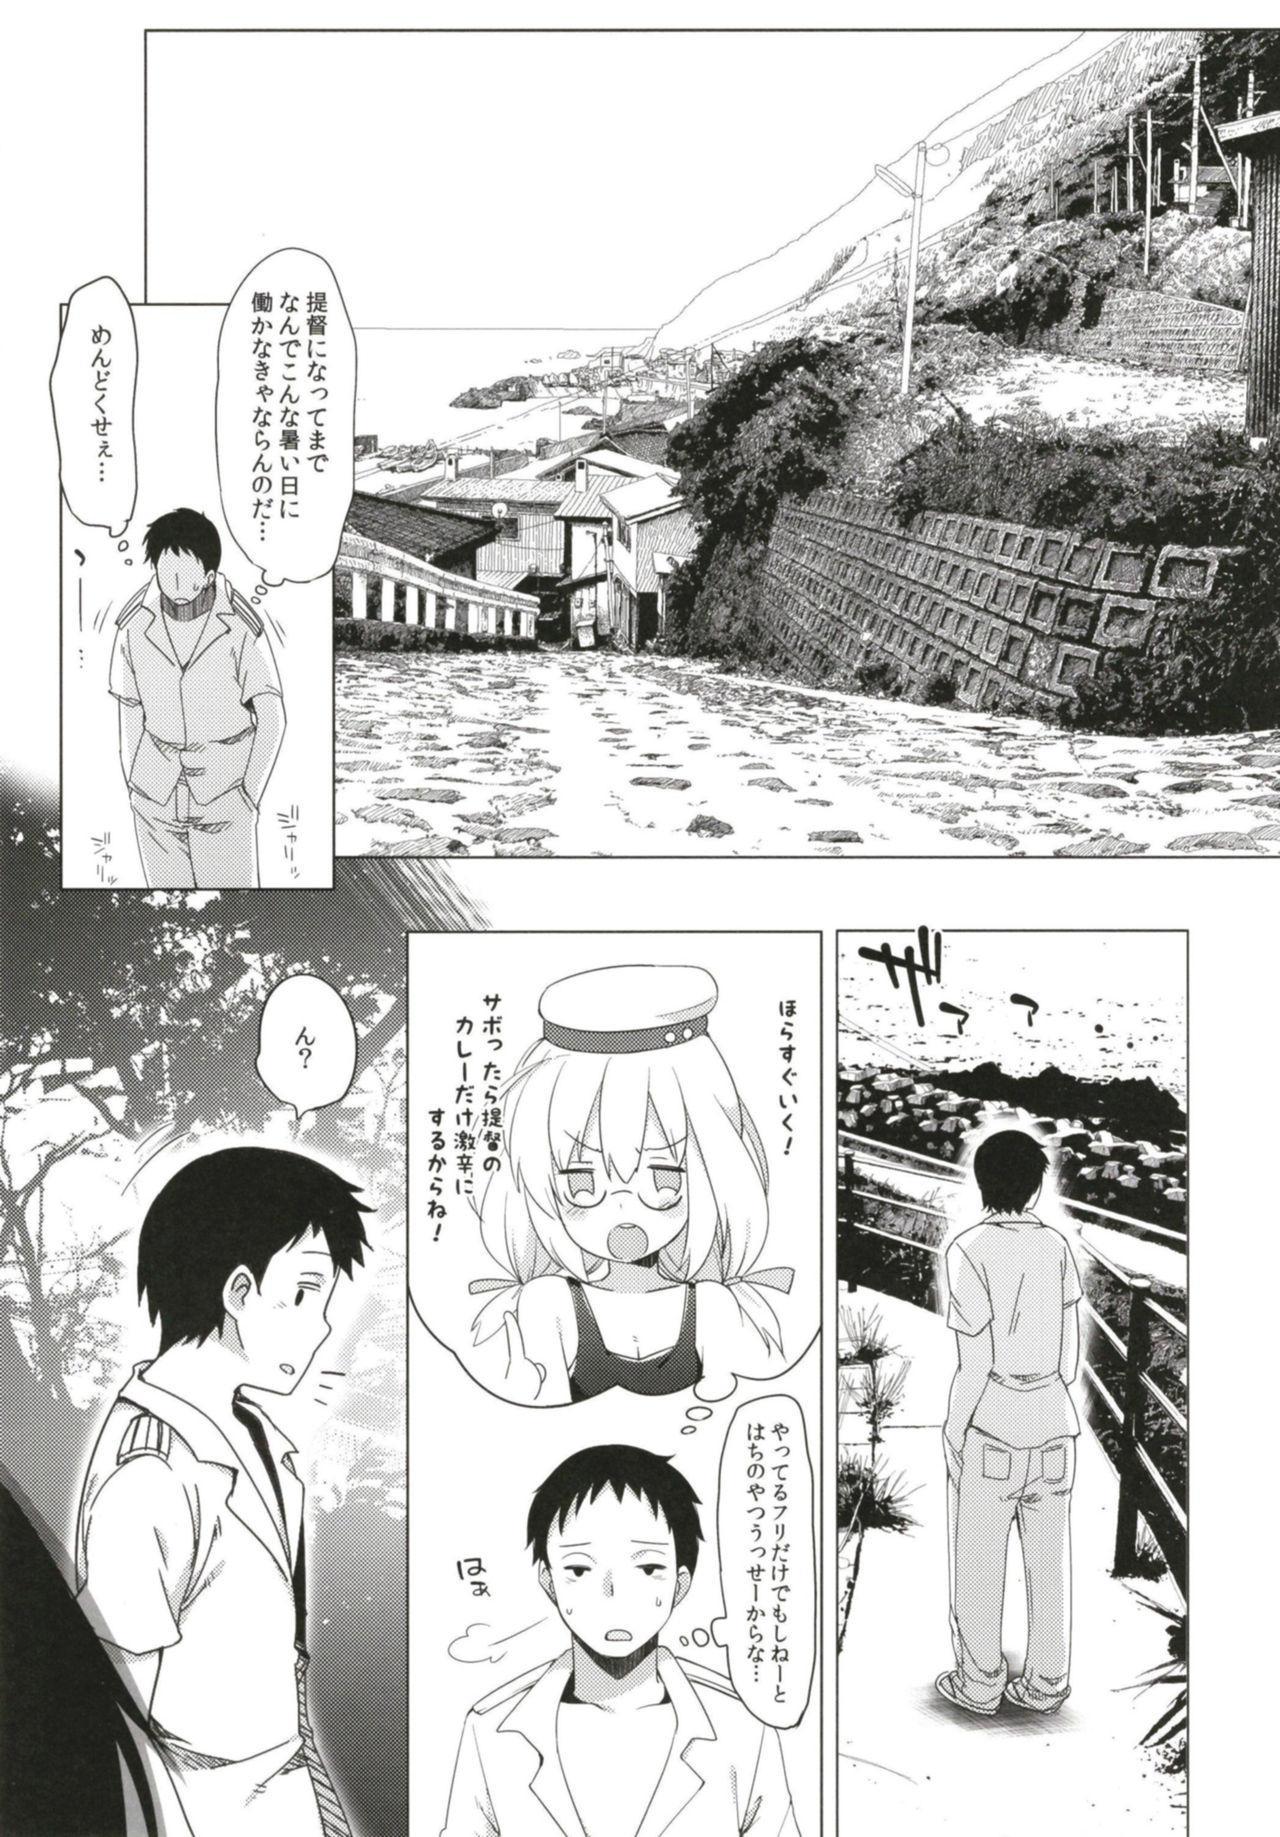 [French letter (Fujisaki Hikari)] Hitonatsu no Ayamachi -I-401 Soushuuhen- (Kantai Collection -KanColle-) [Digital] 6